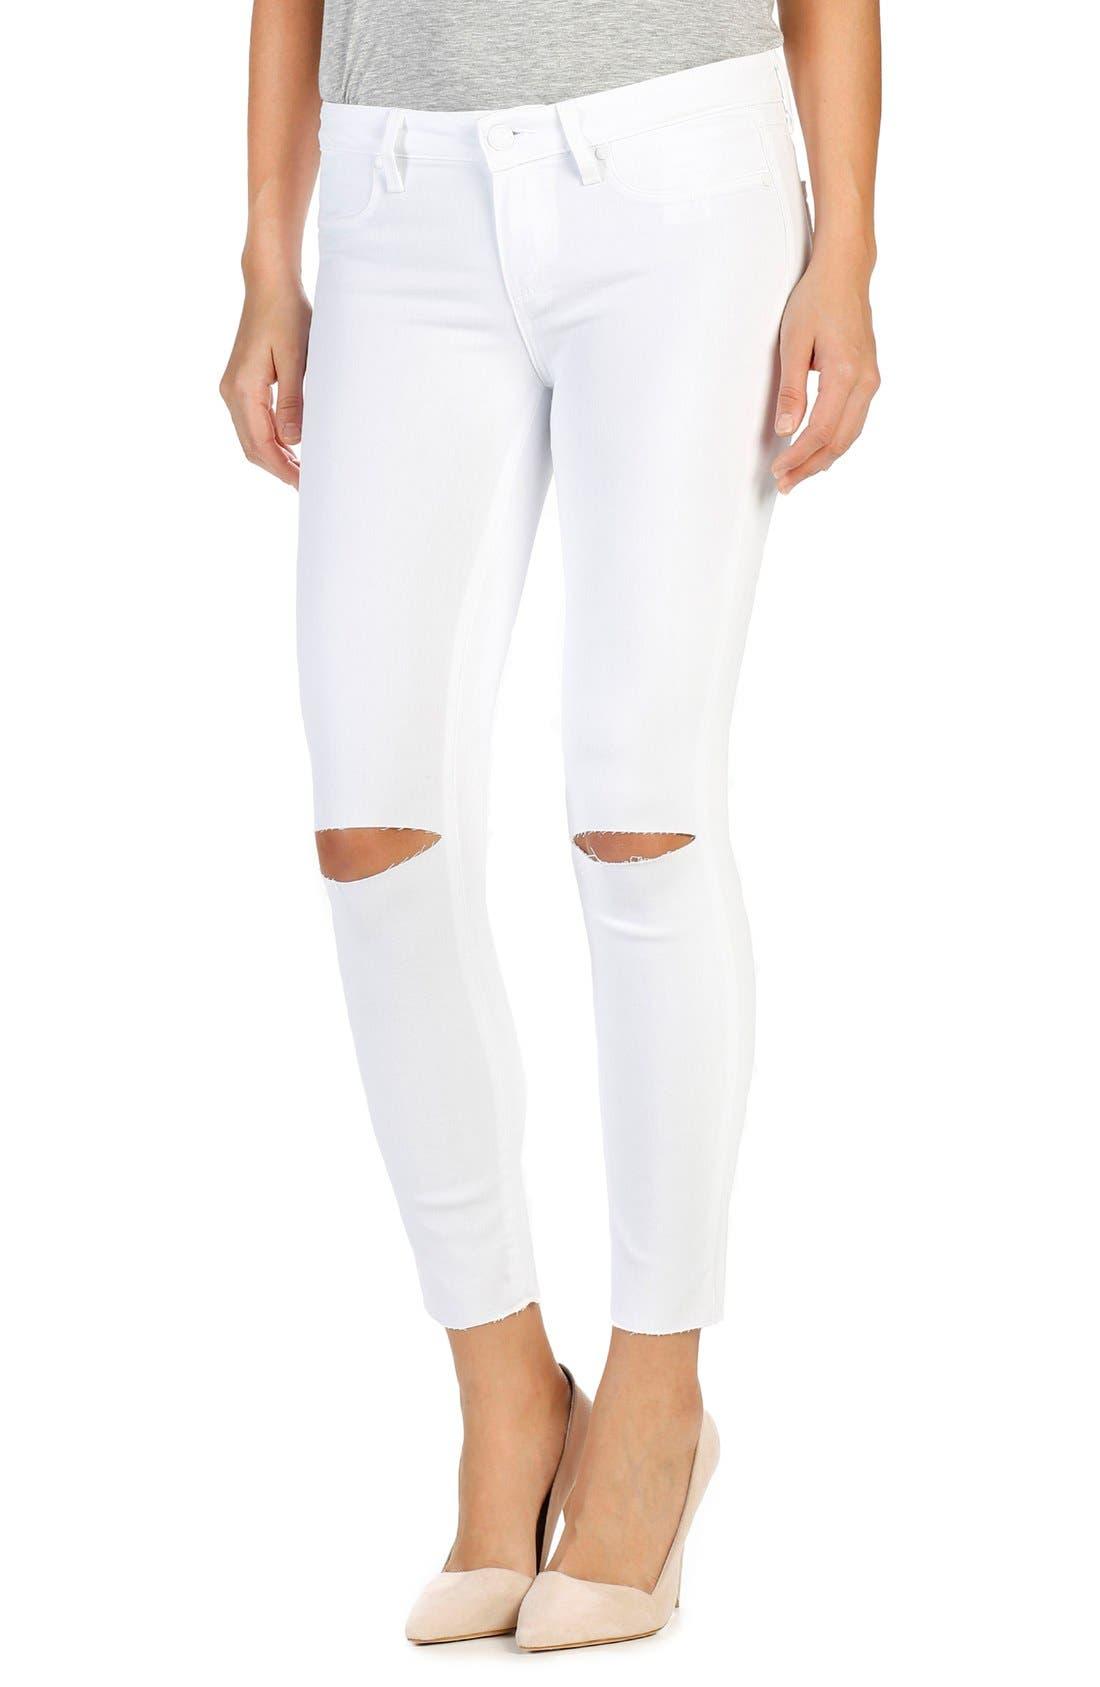 Main Image - PAIGE Transcend - Verdugo Ankle Skinny Jeans (White Cloud Destructed)